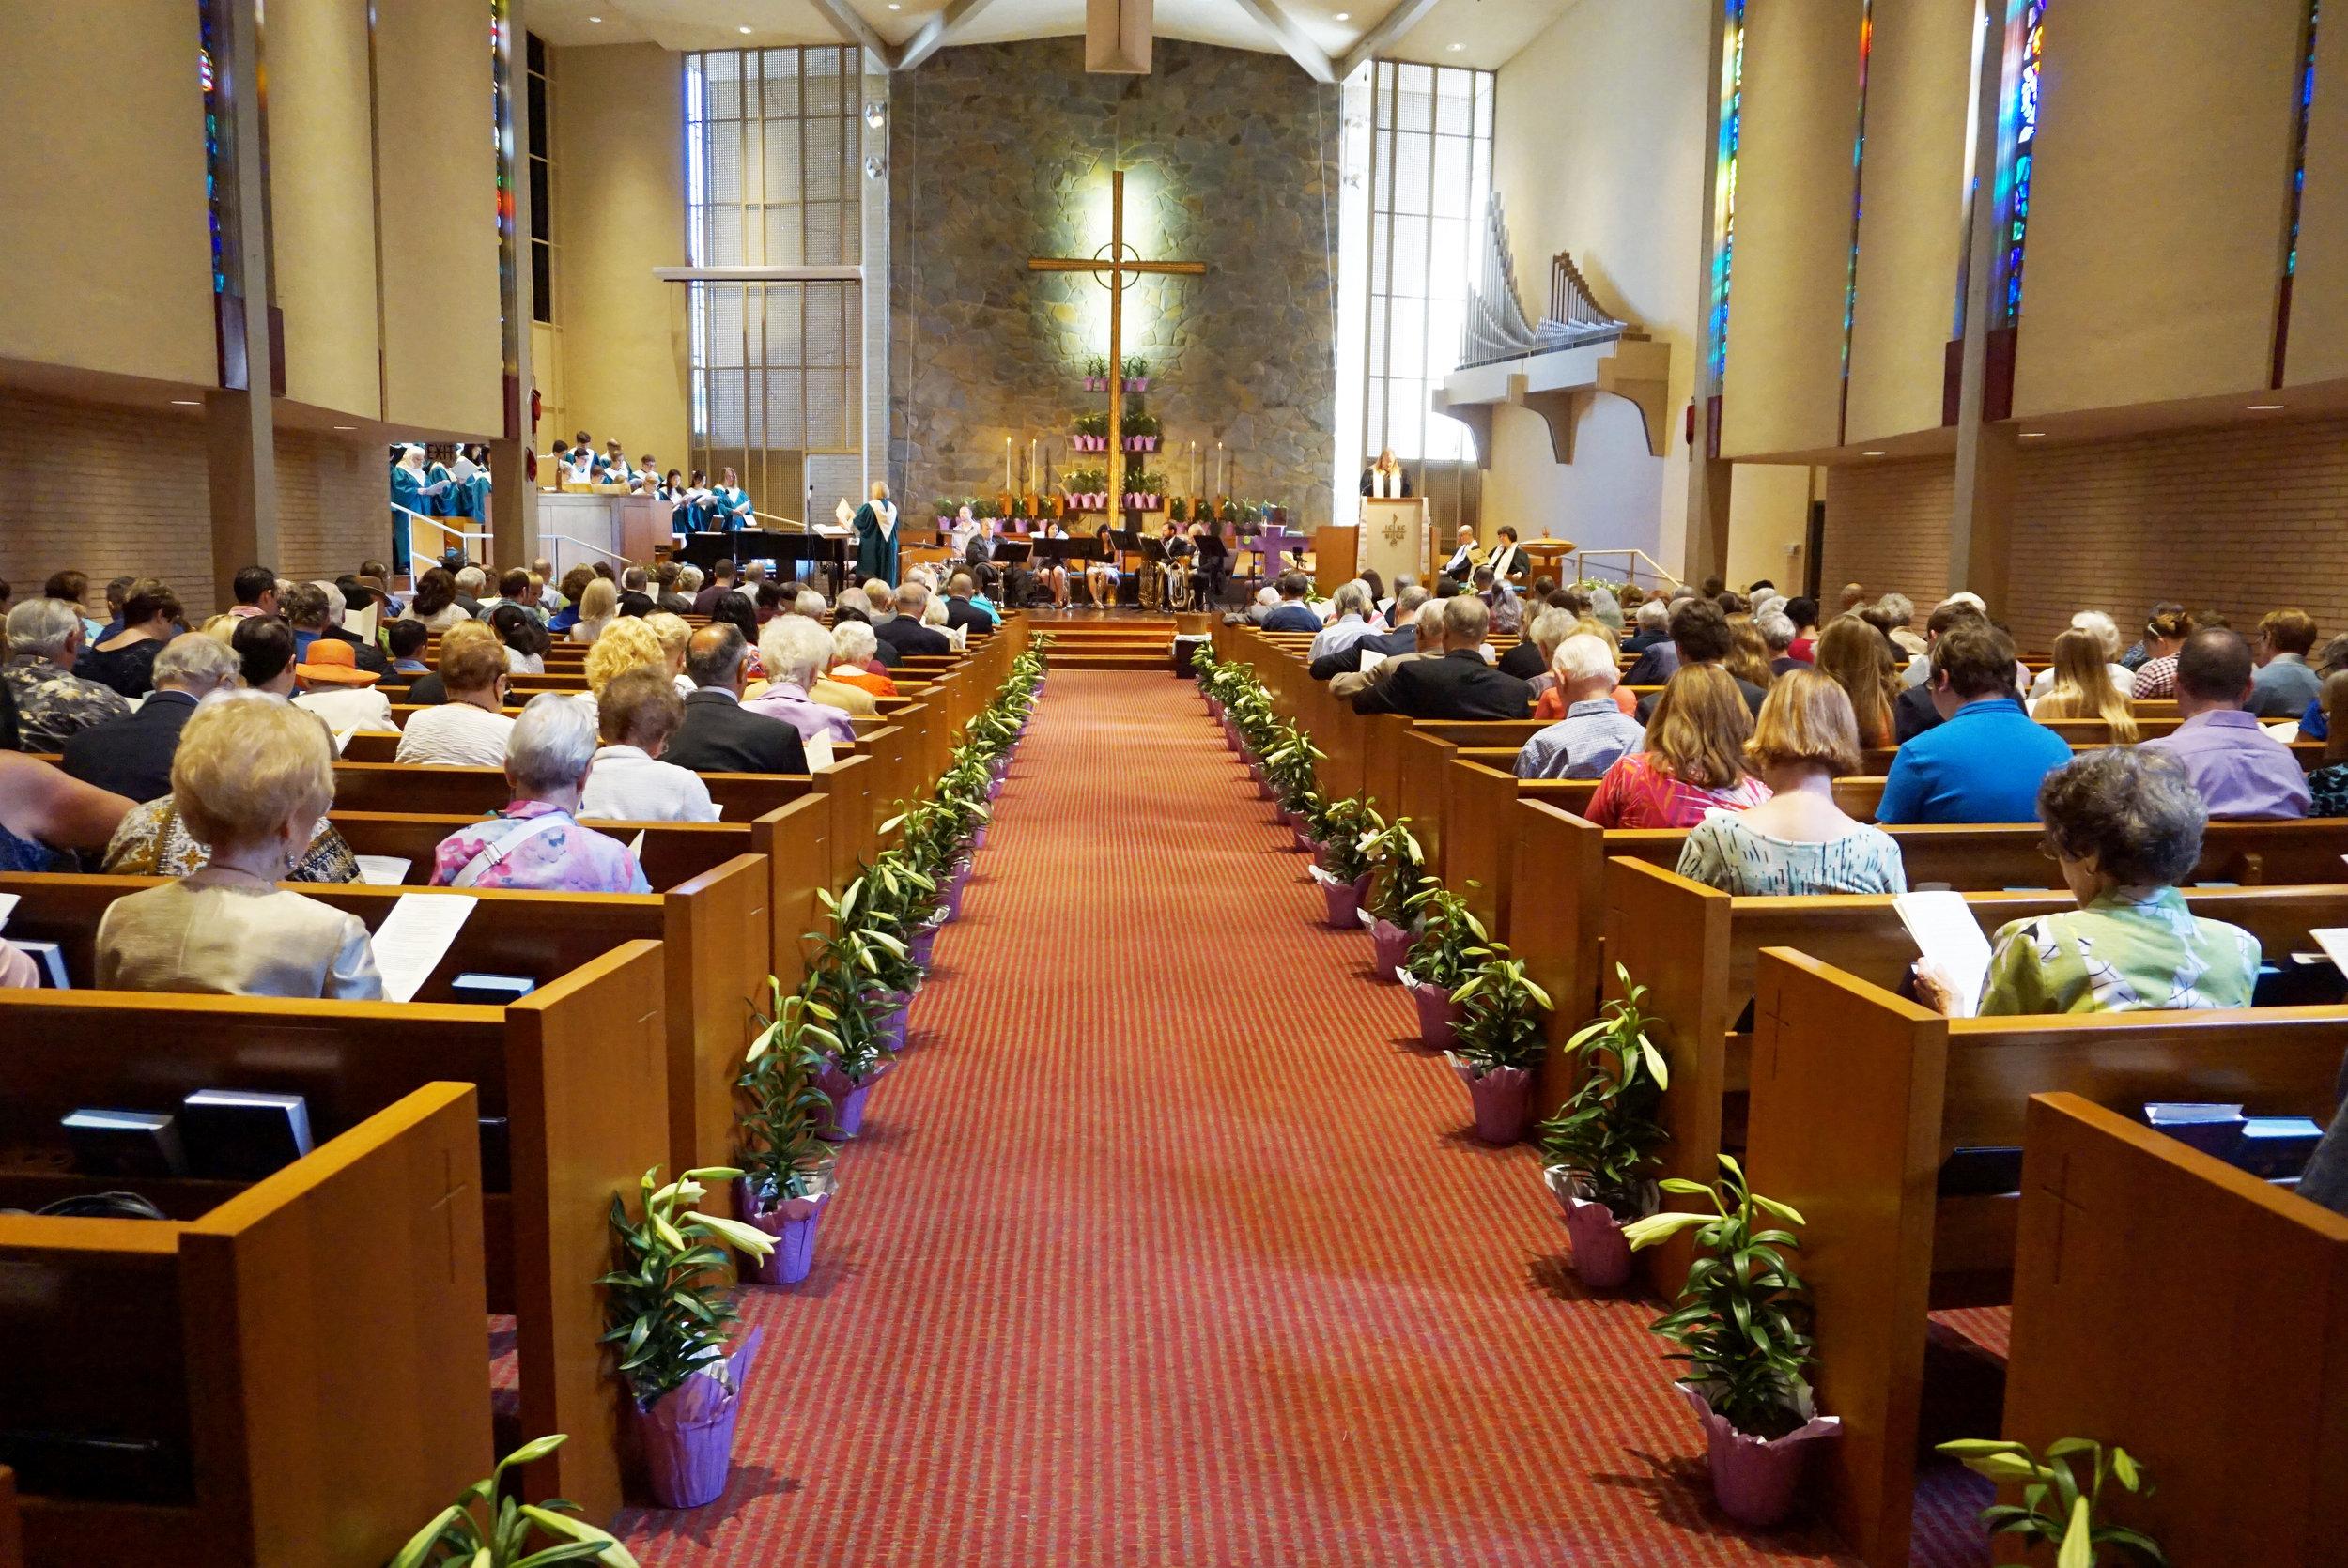 Claremont-Presbyterian-Church-Congregation-14.jpg